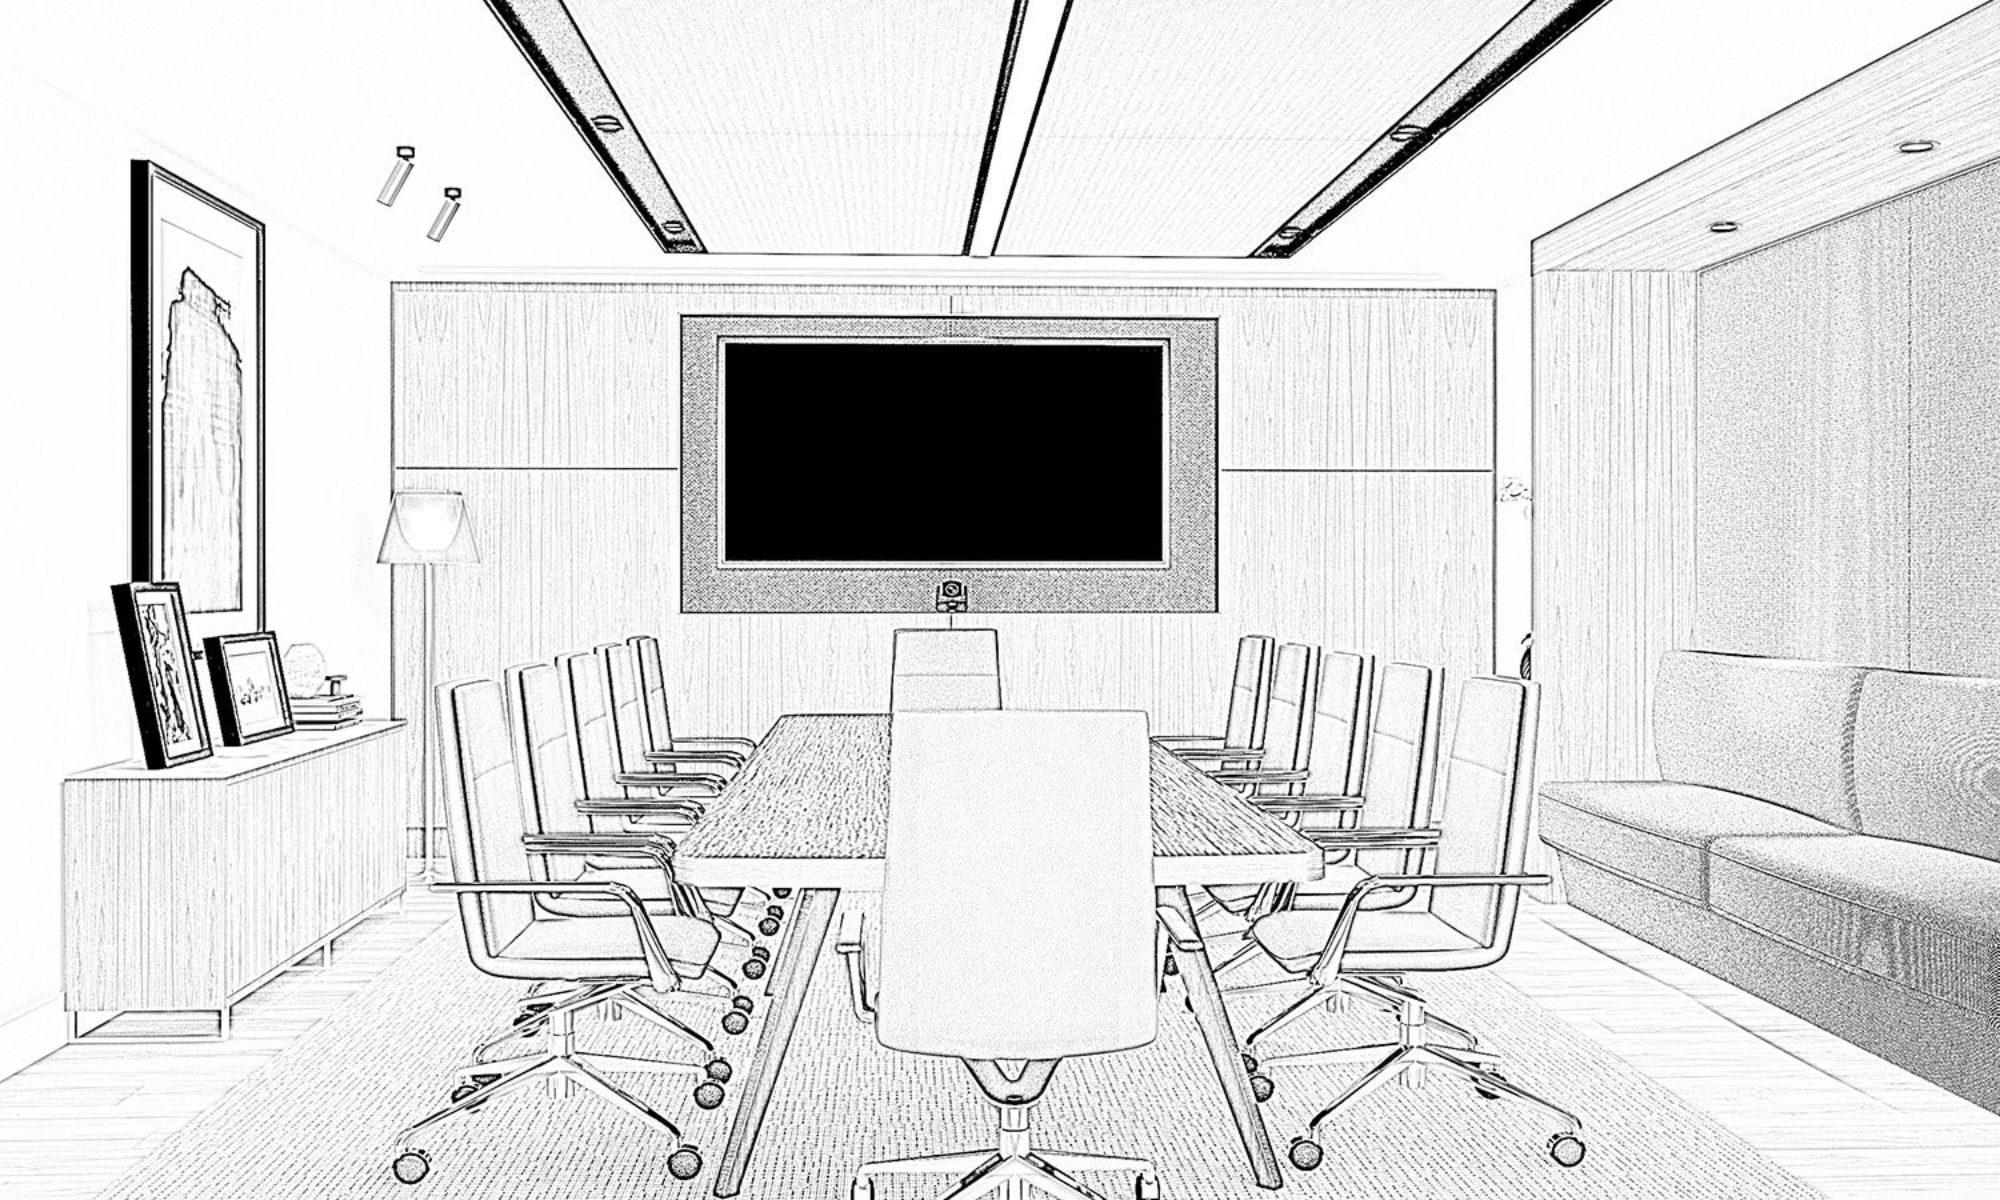 Dodge & Cox office design ideas